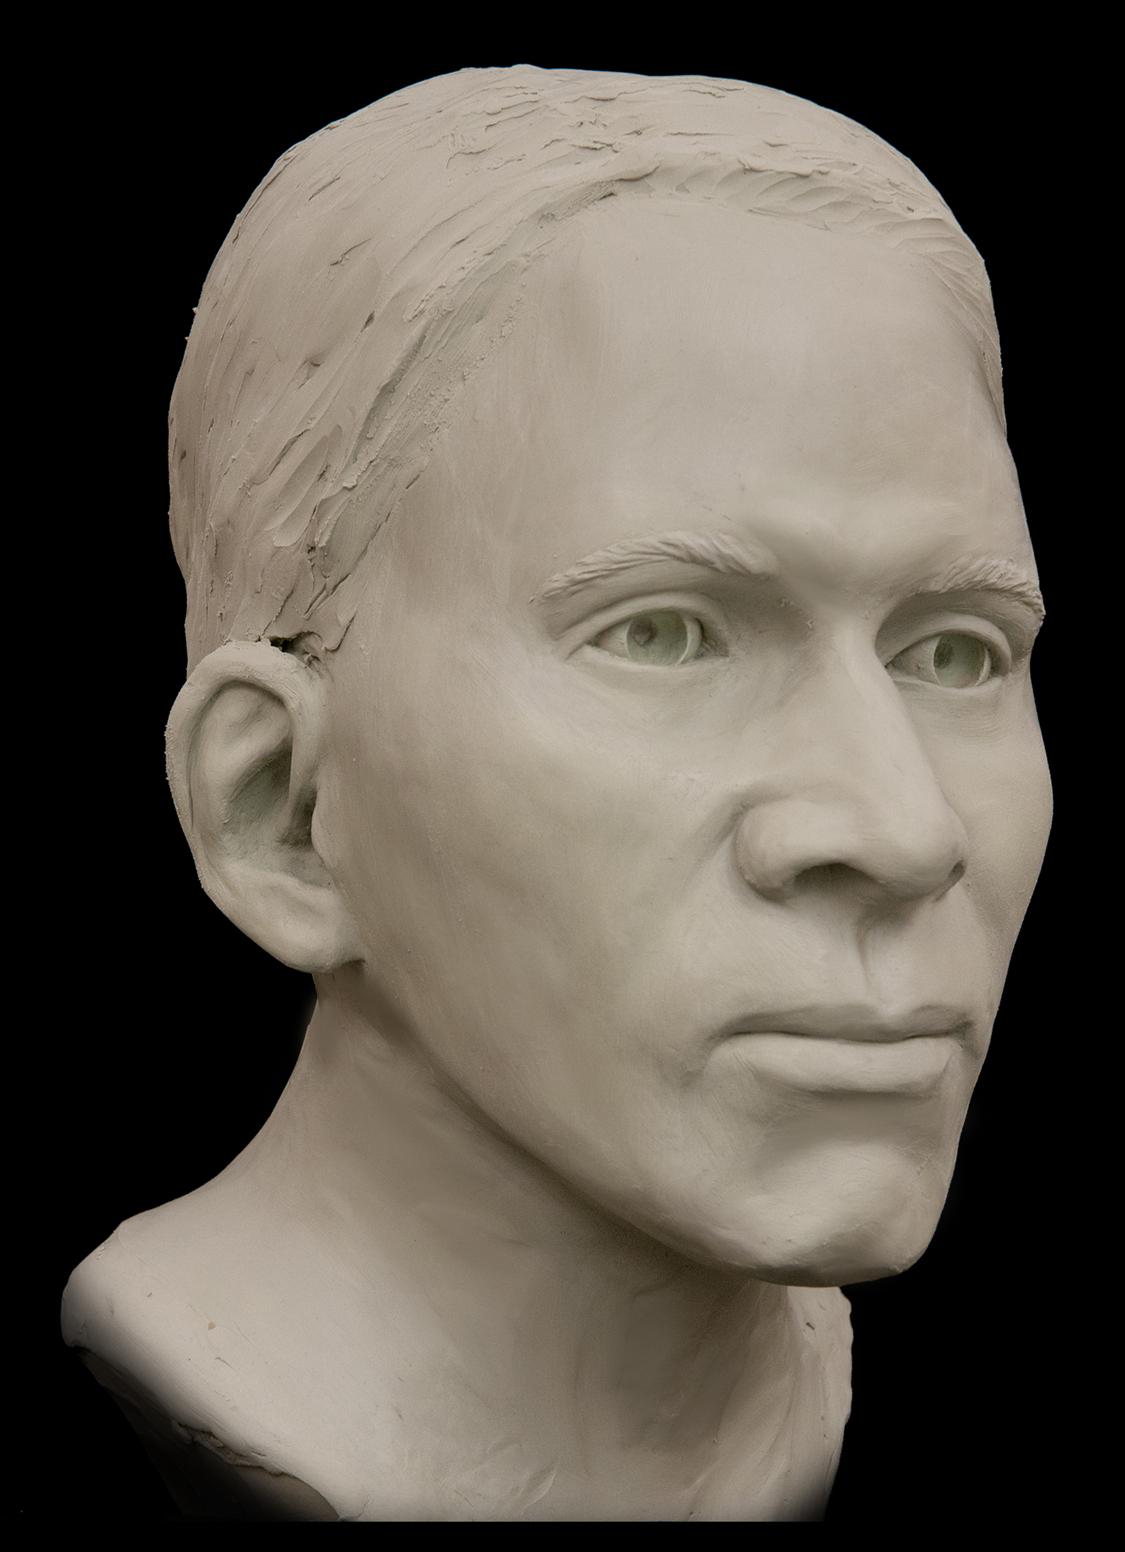 Caroline County John Doe (Younger decedent)